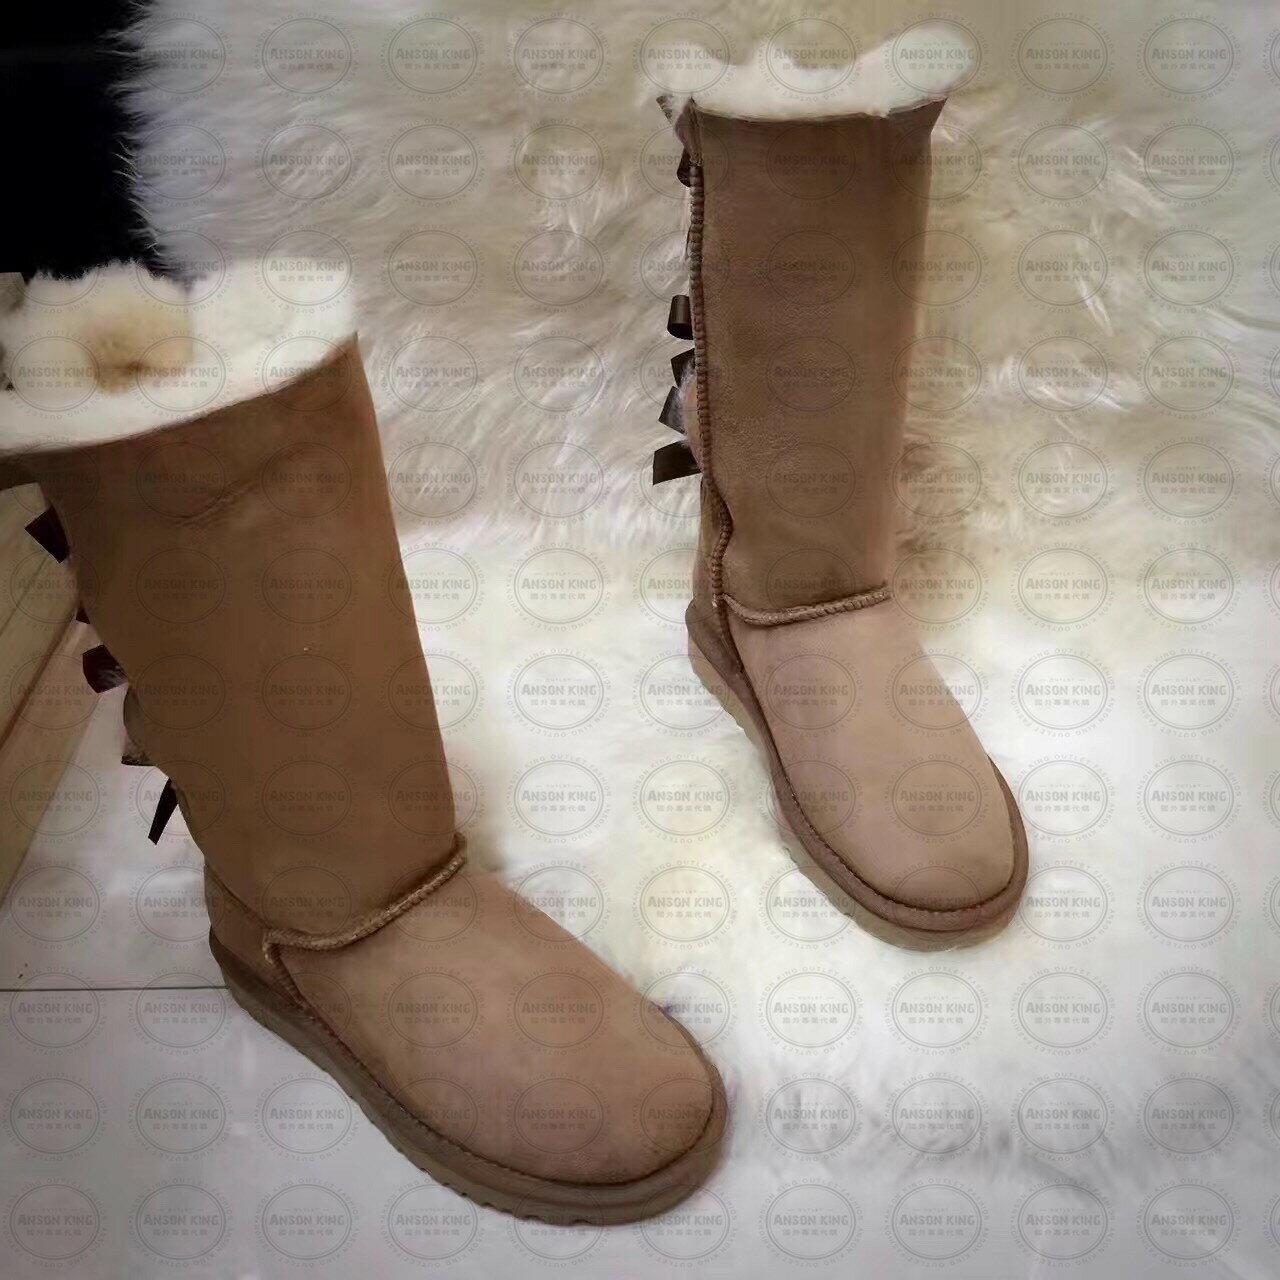 OUTLET正品代購 澳洲 UGG 一體女式絲帶蝴蝶結 保暖 真皮羊皮毛 雪靴 短靴 棕色 1